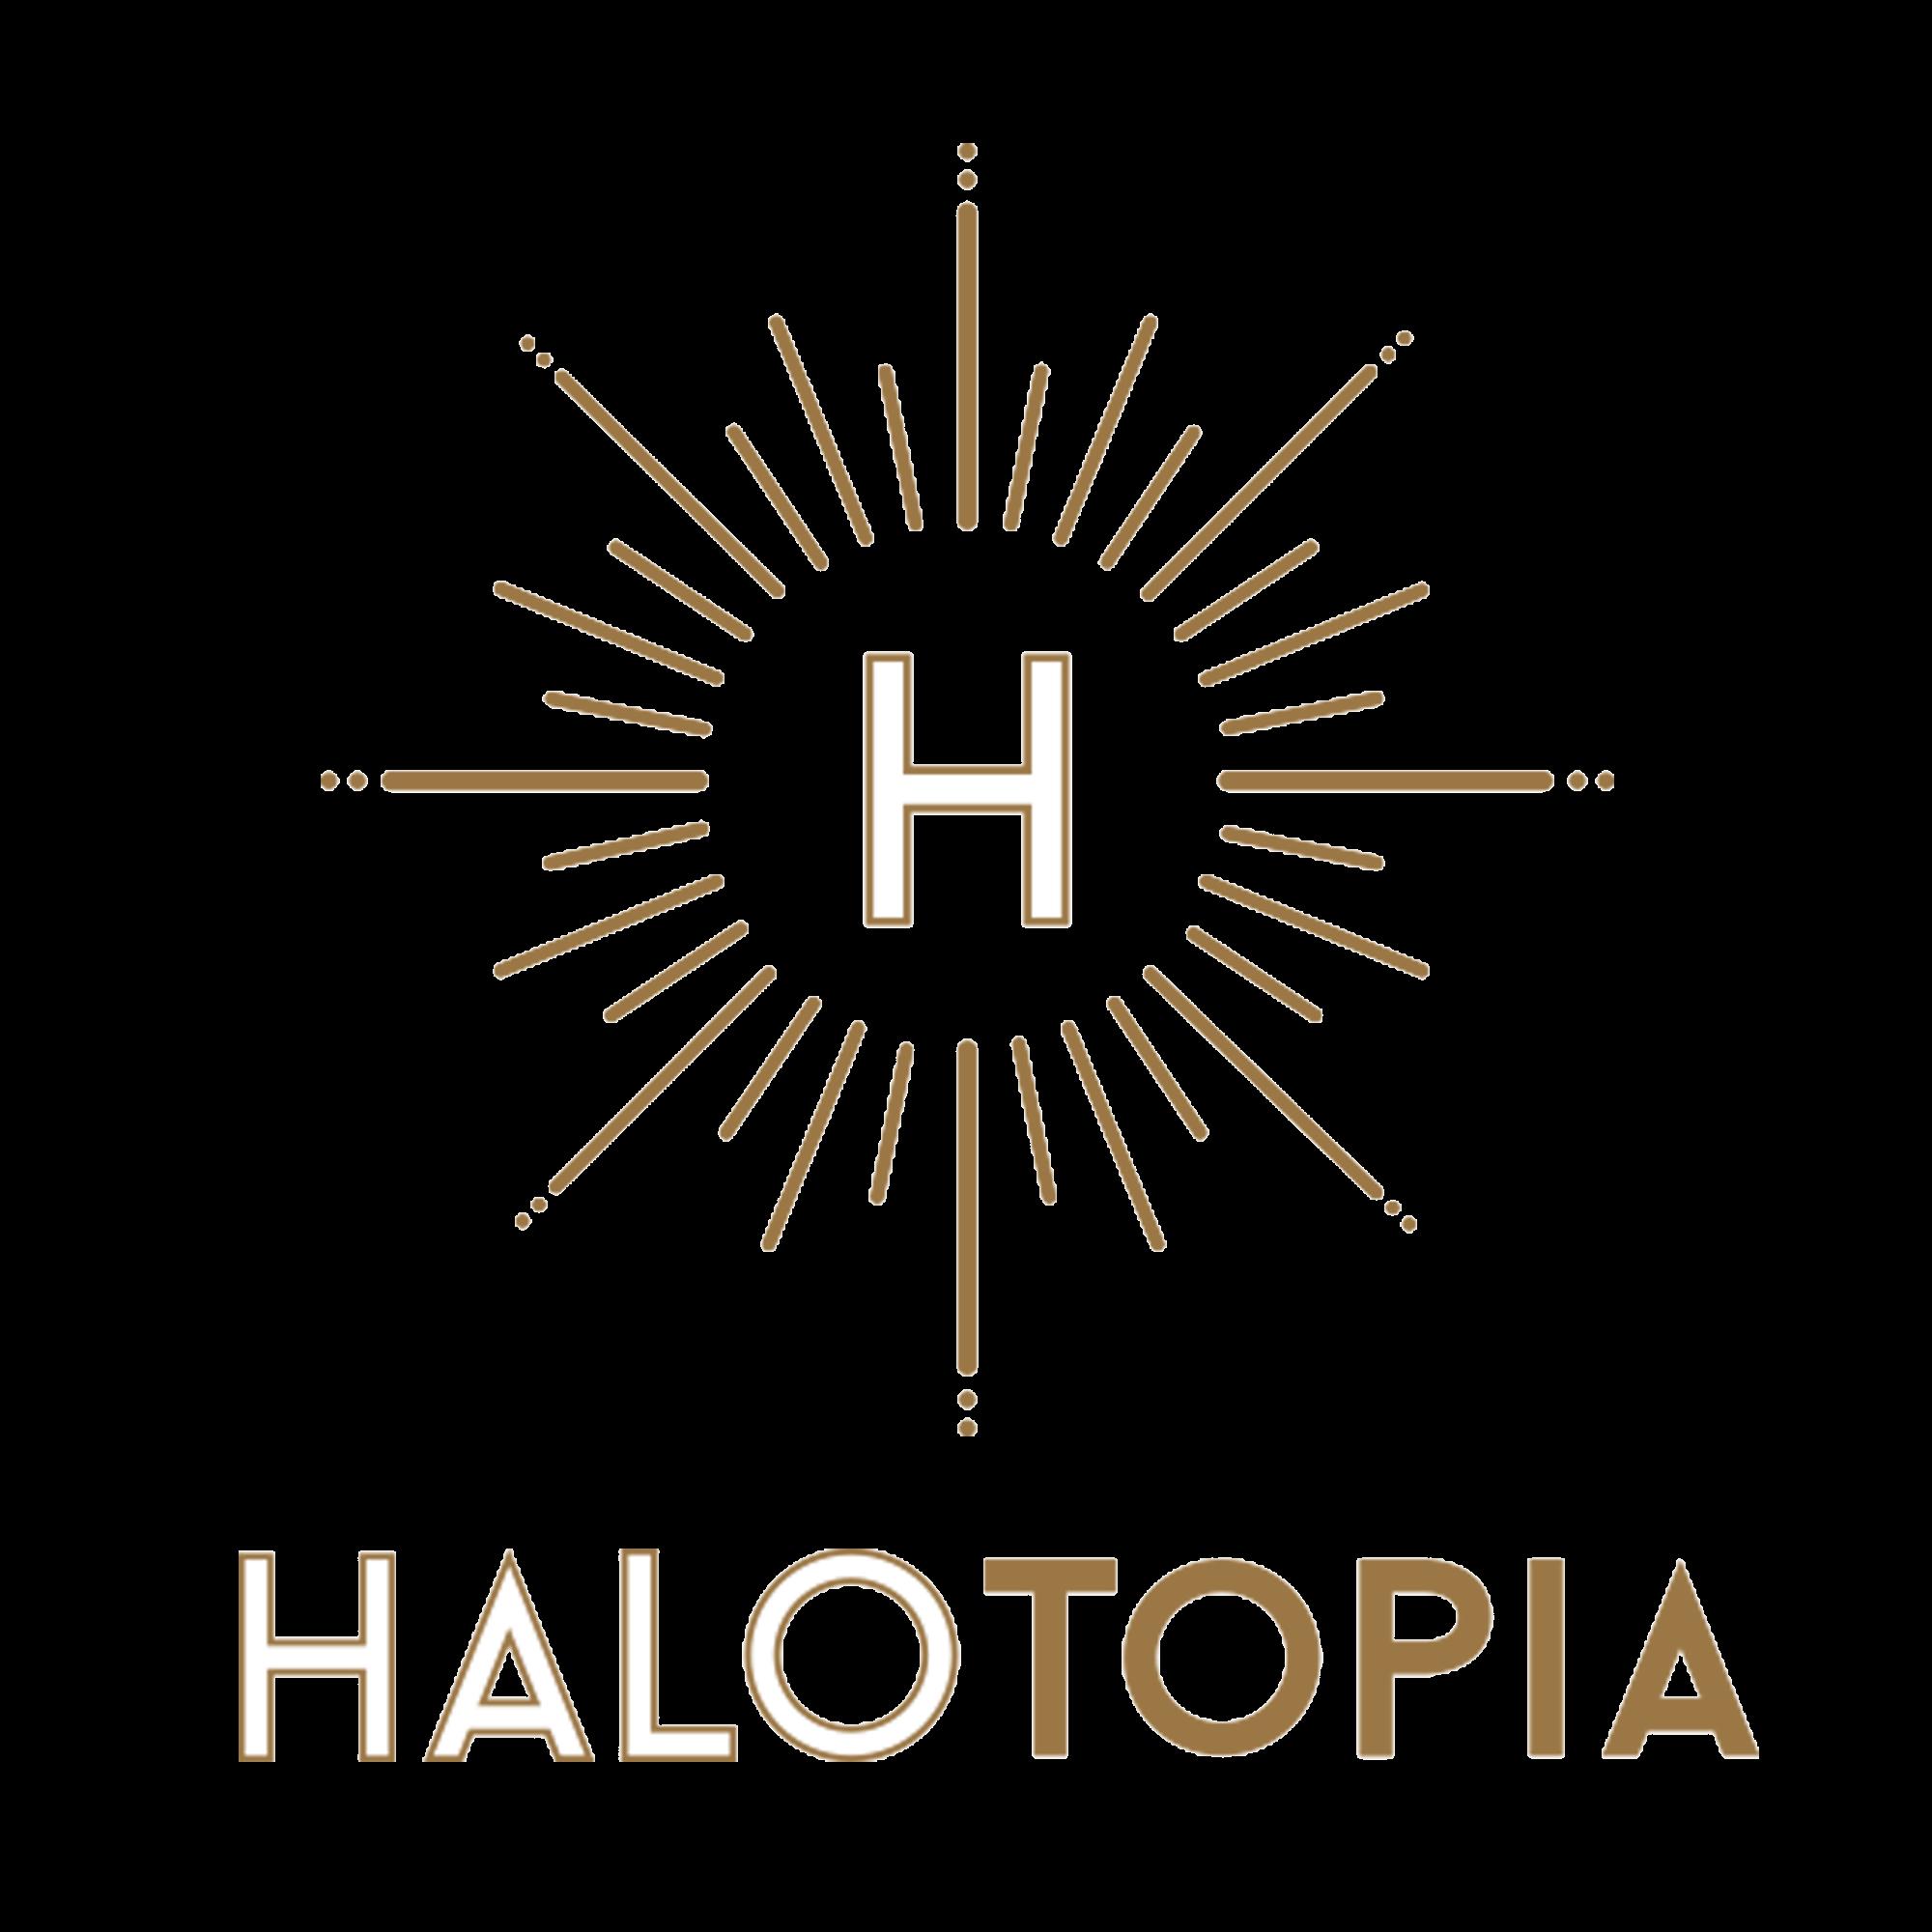 Halotopia